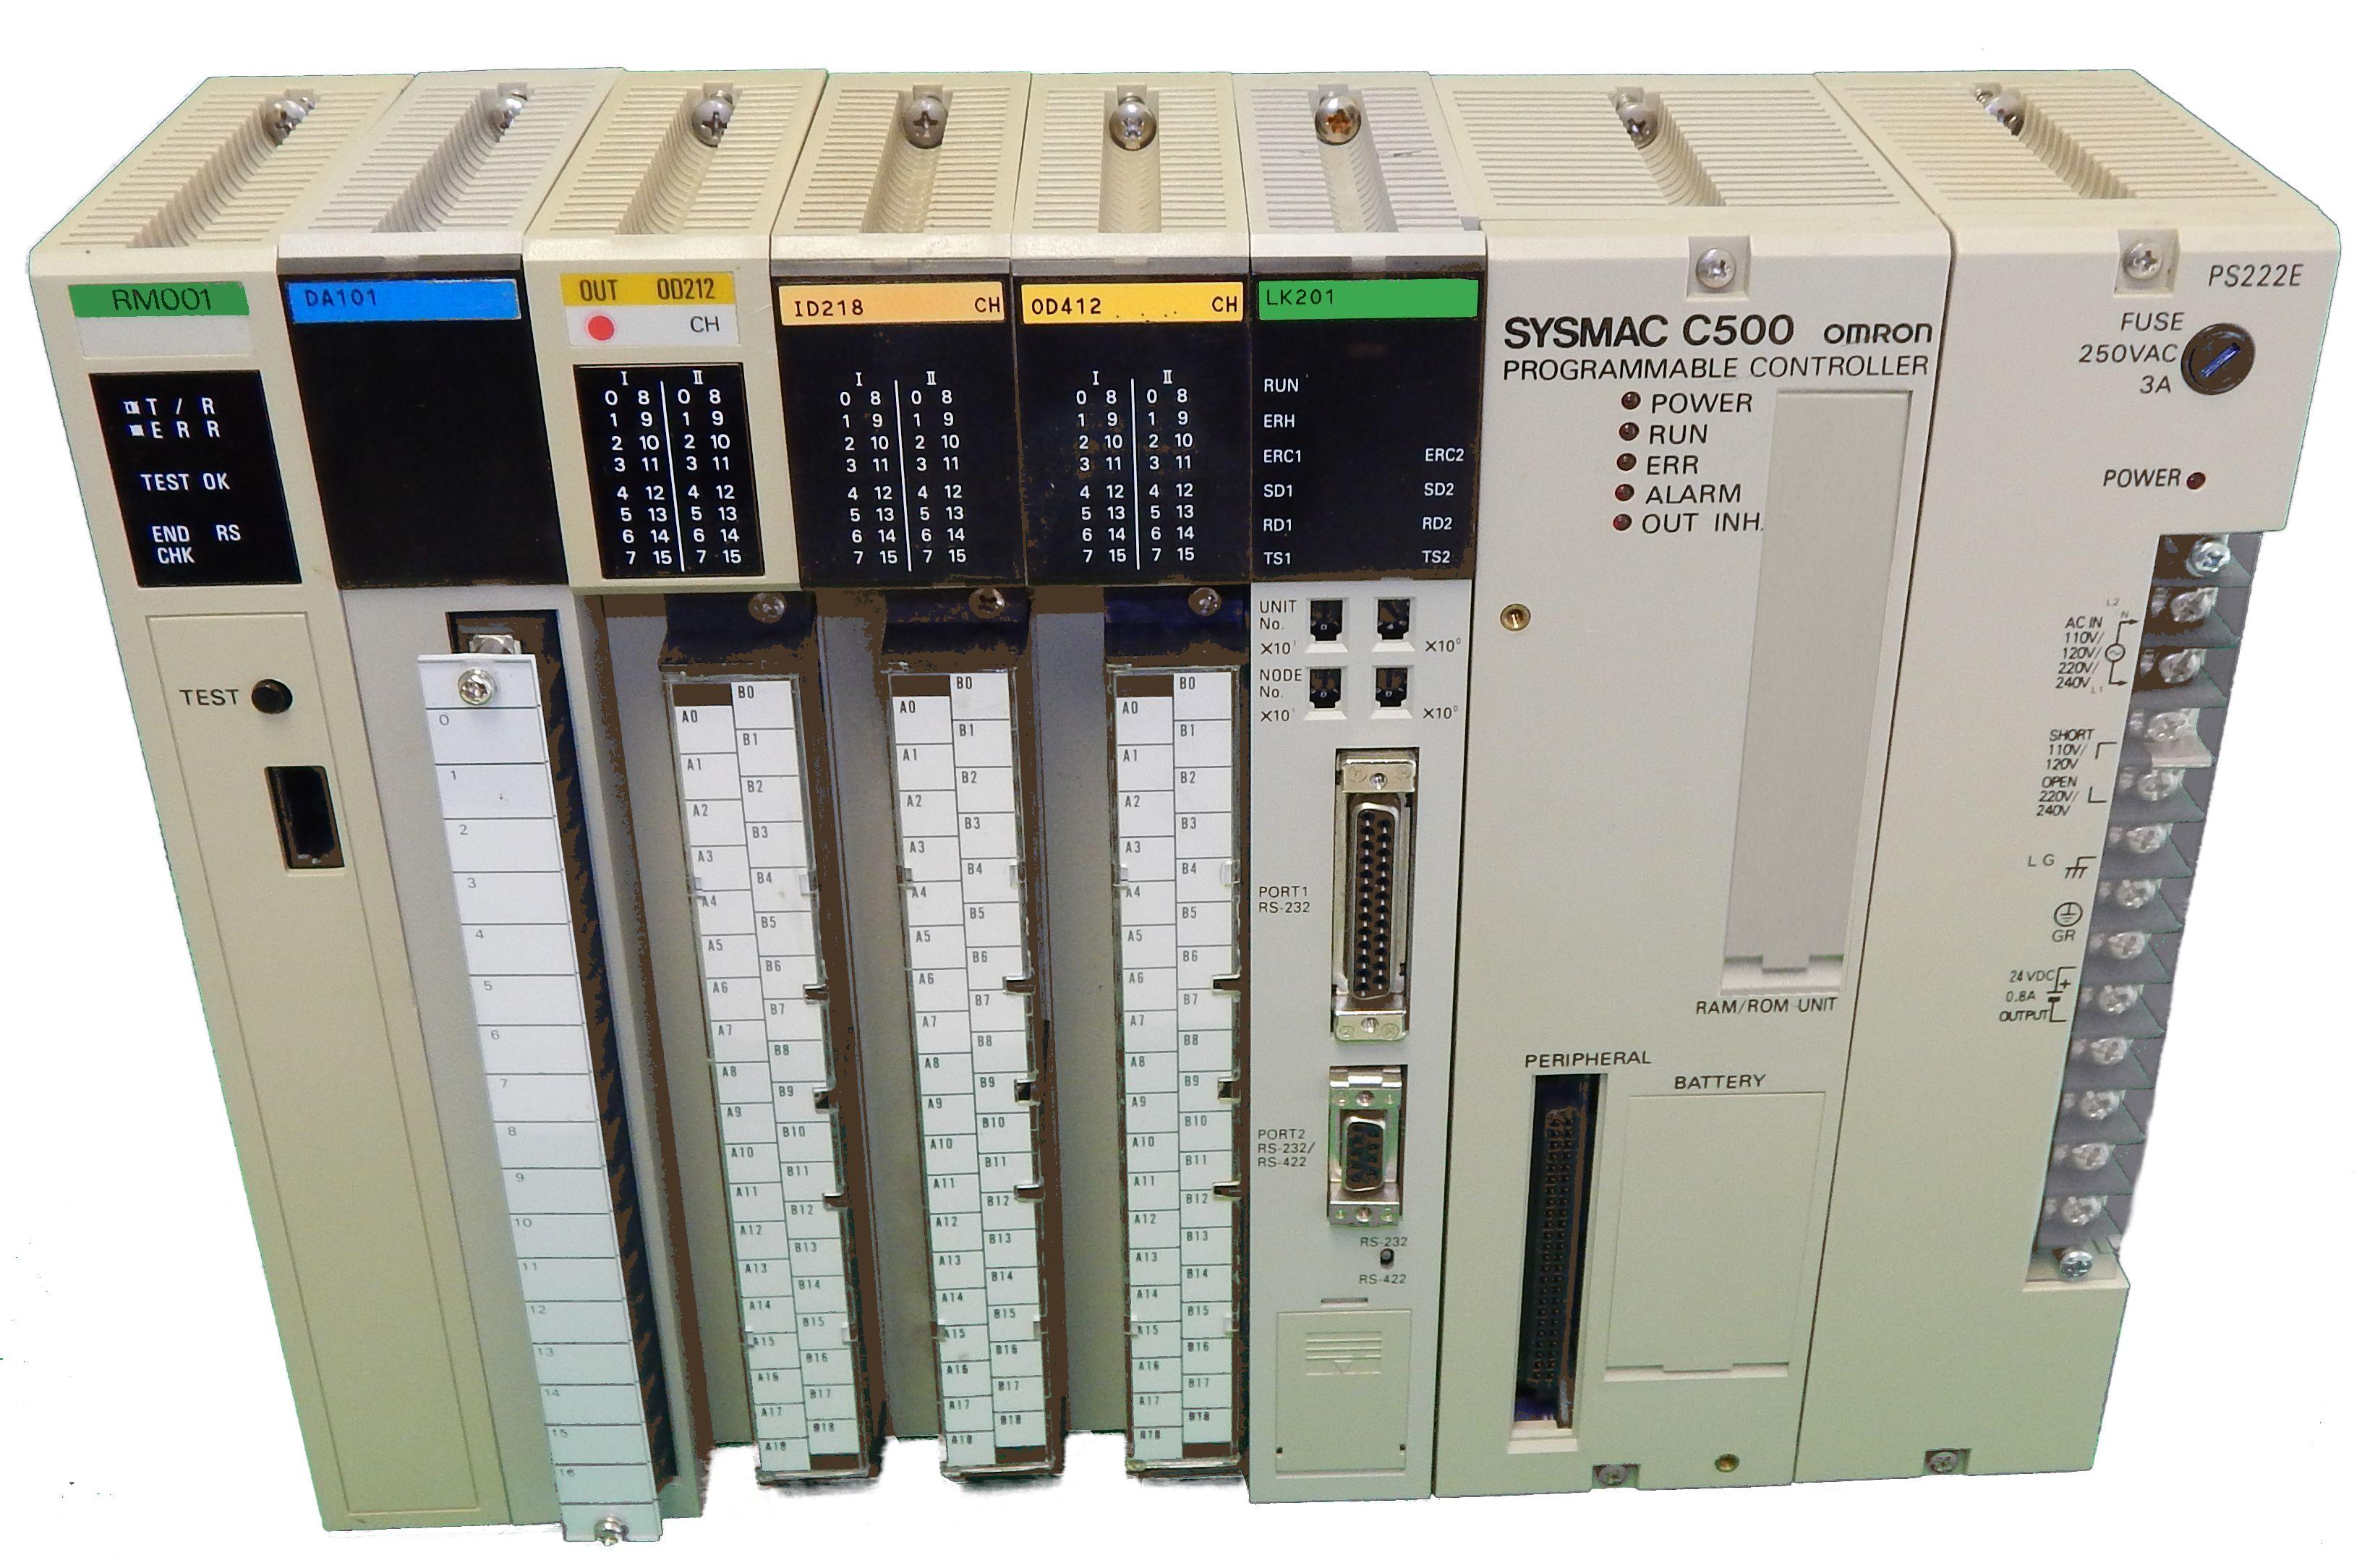 3G2C4-CPU33-E